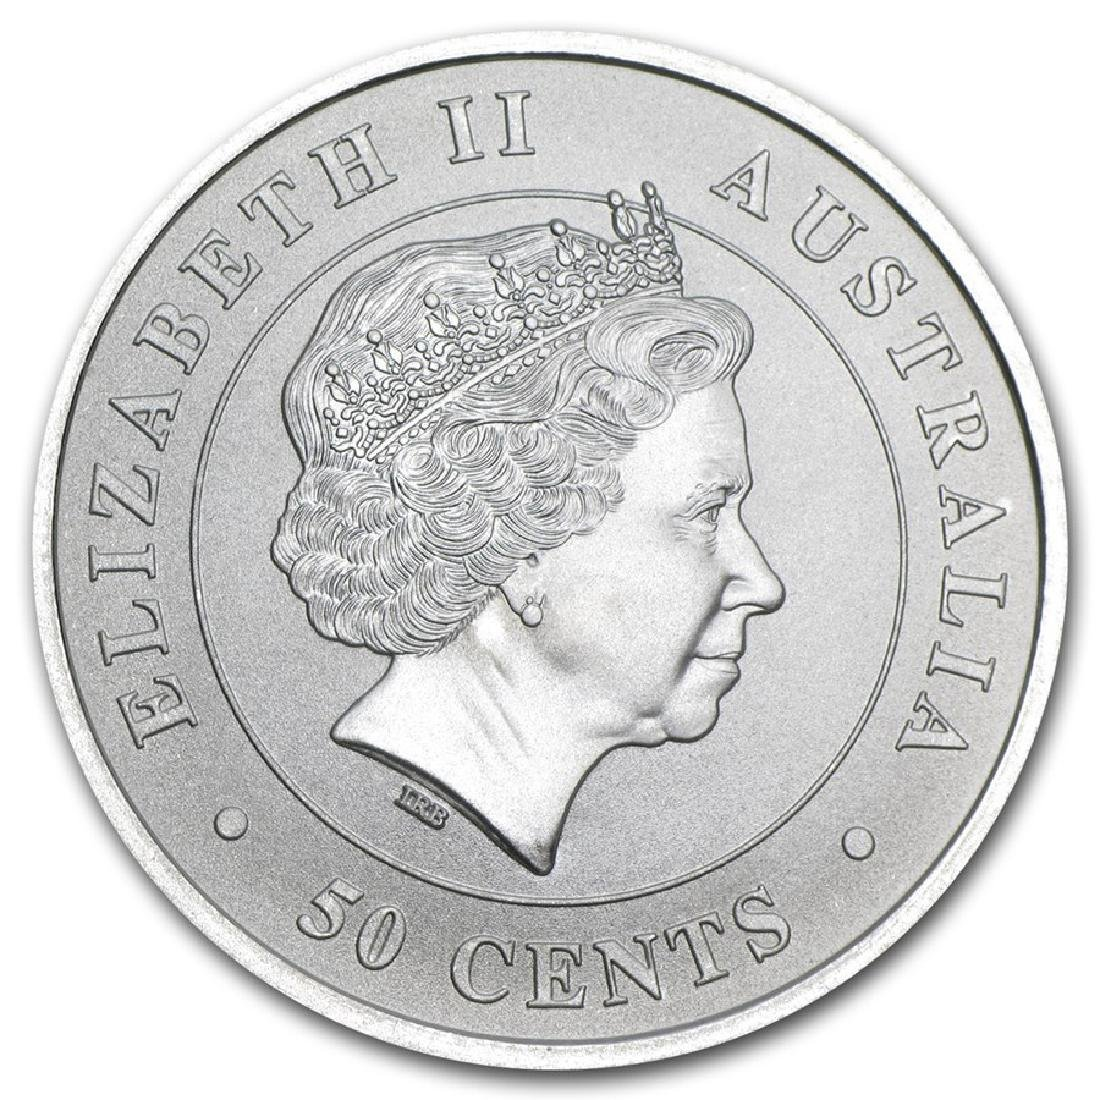 2014 Australia Great White Shark 1/2 oz Silver Coin - 2